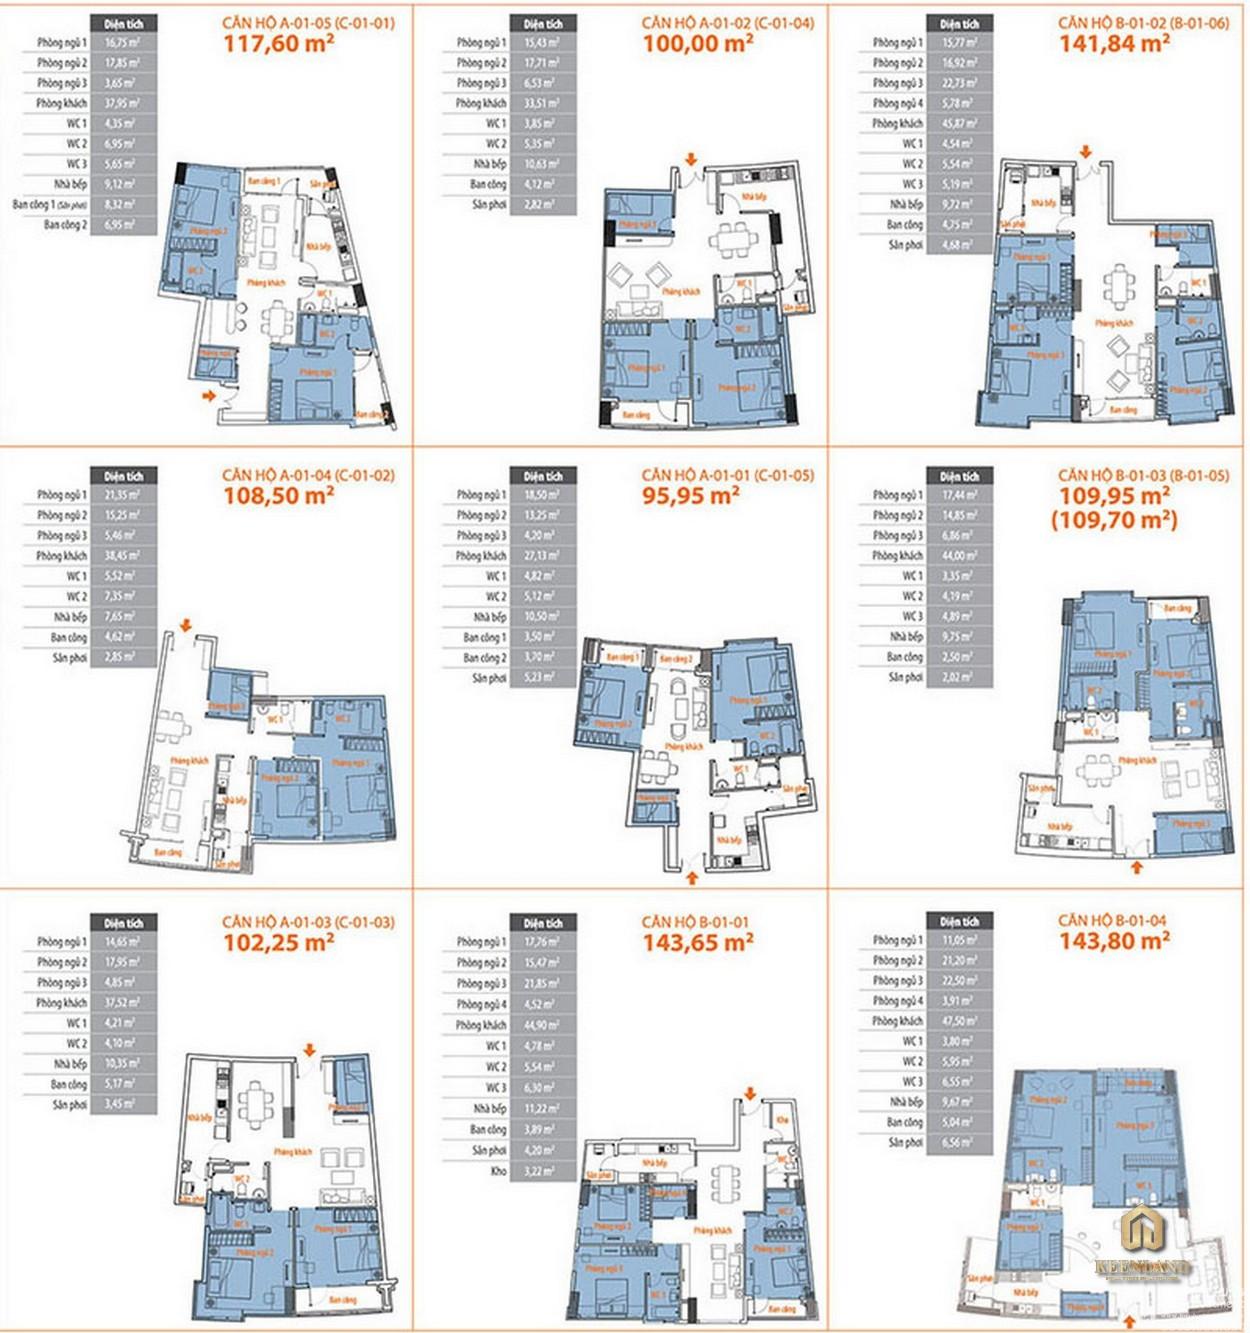 Thiết kế chi tiết căn hộ Him Lam Riverside Quận 7